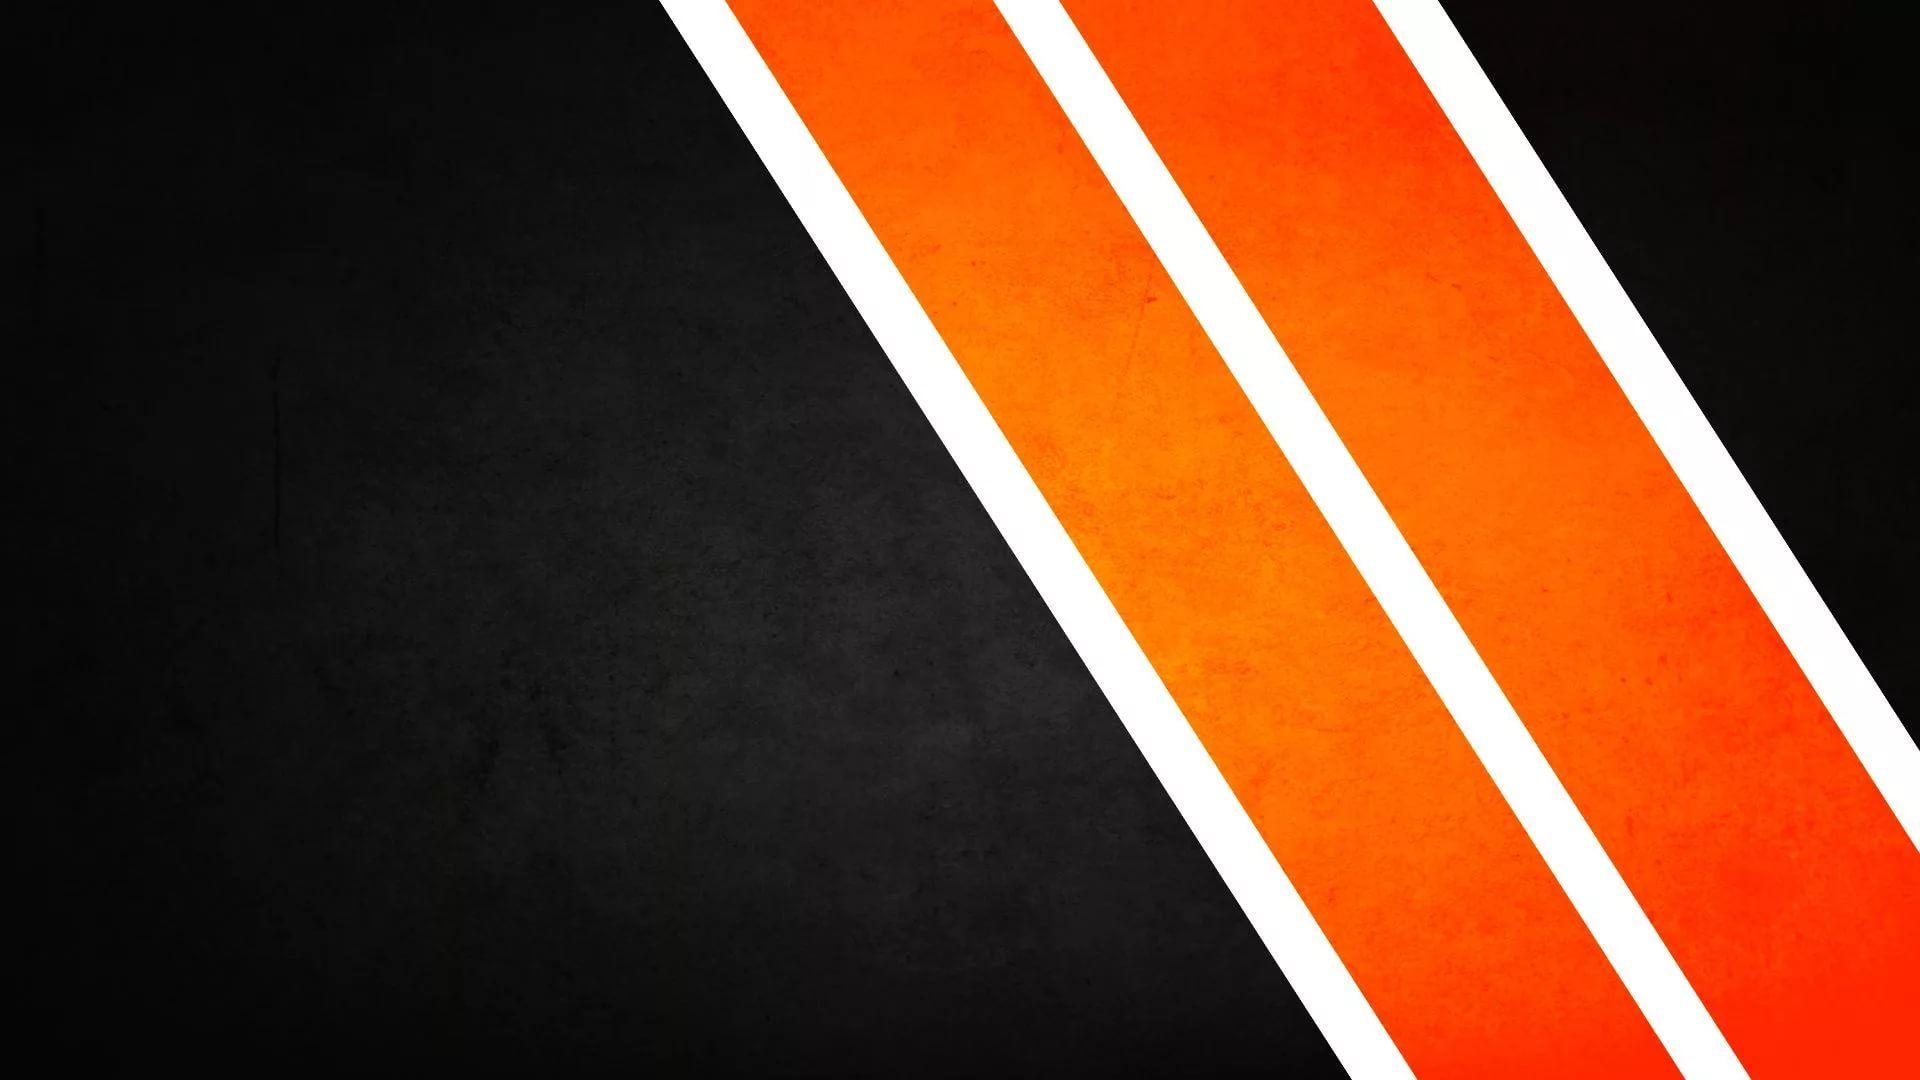 Black And Orange a wallpaper